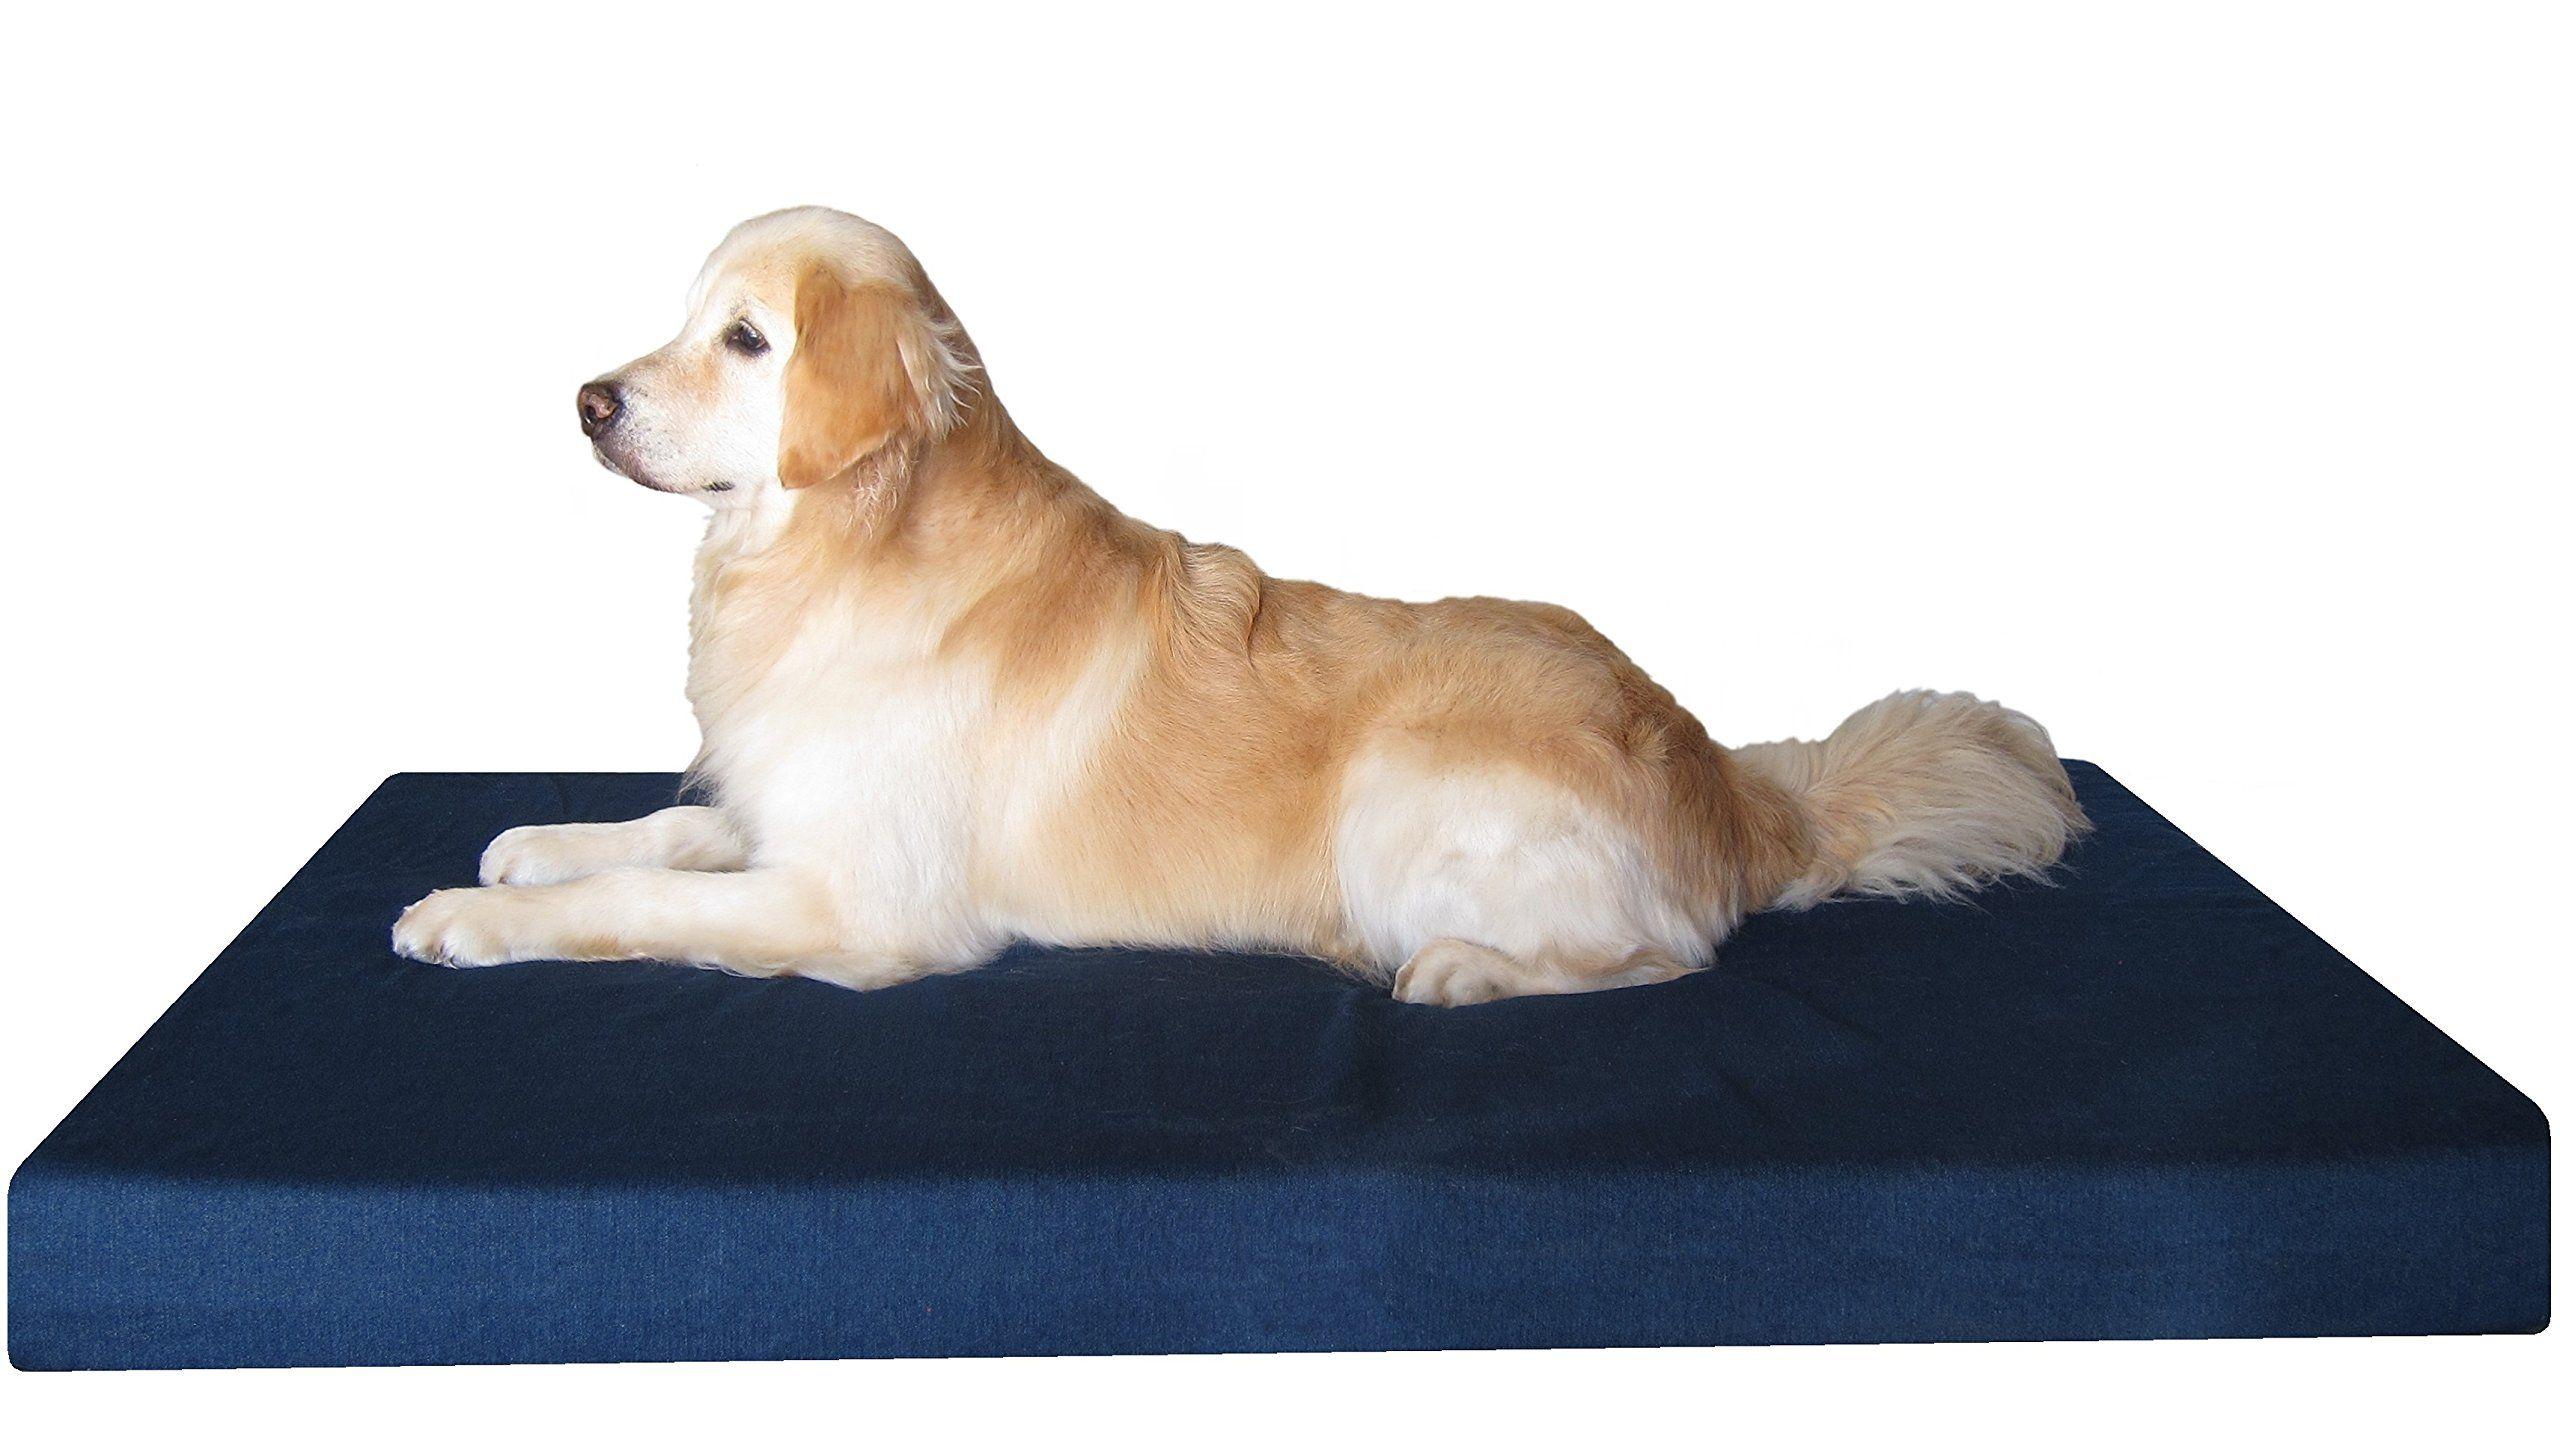 Dogbed4less Orthopedic Waterproof Heavy Duty Gel Memory